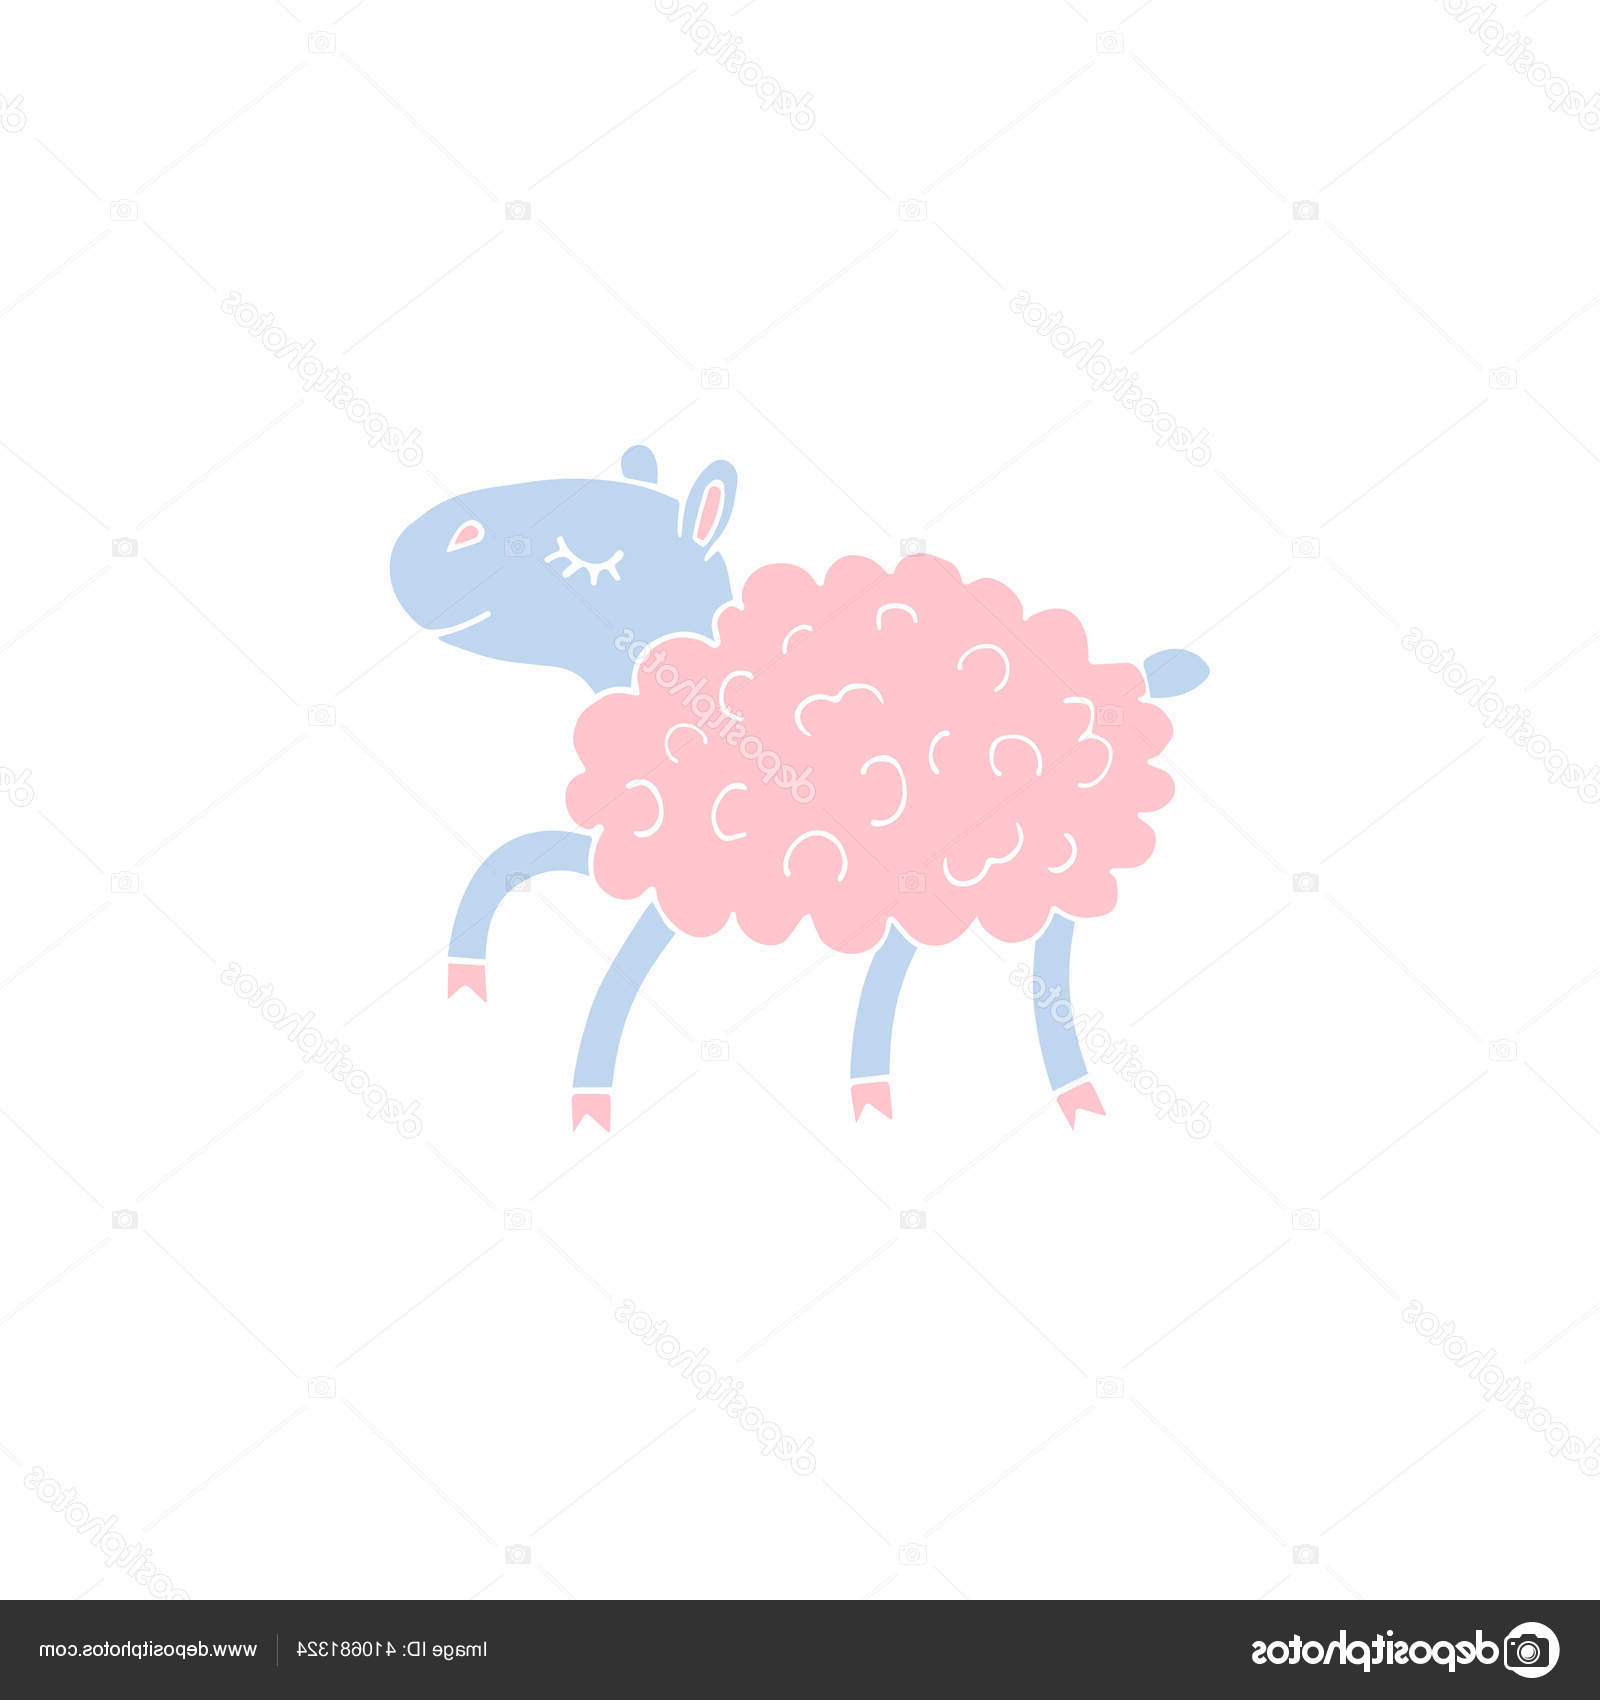 Vektor Tangan Gambar Sketsa Corat Coret Pastel Berjalan regarding Gambar Domba Sketsa